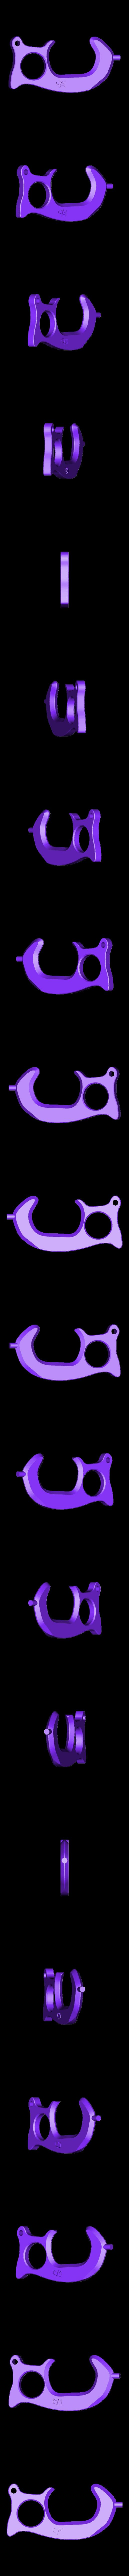 Tirador y Pulsador.stl Download free STL file Handle and button • 3D printing design, PepeRepepe